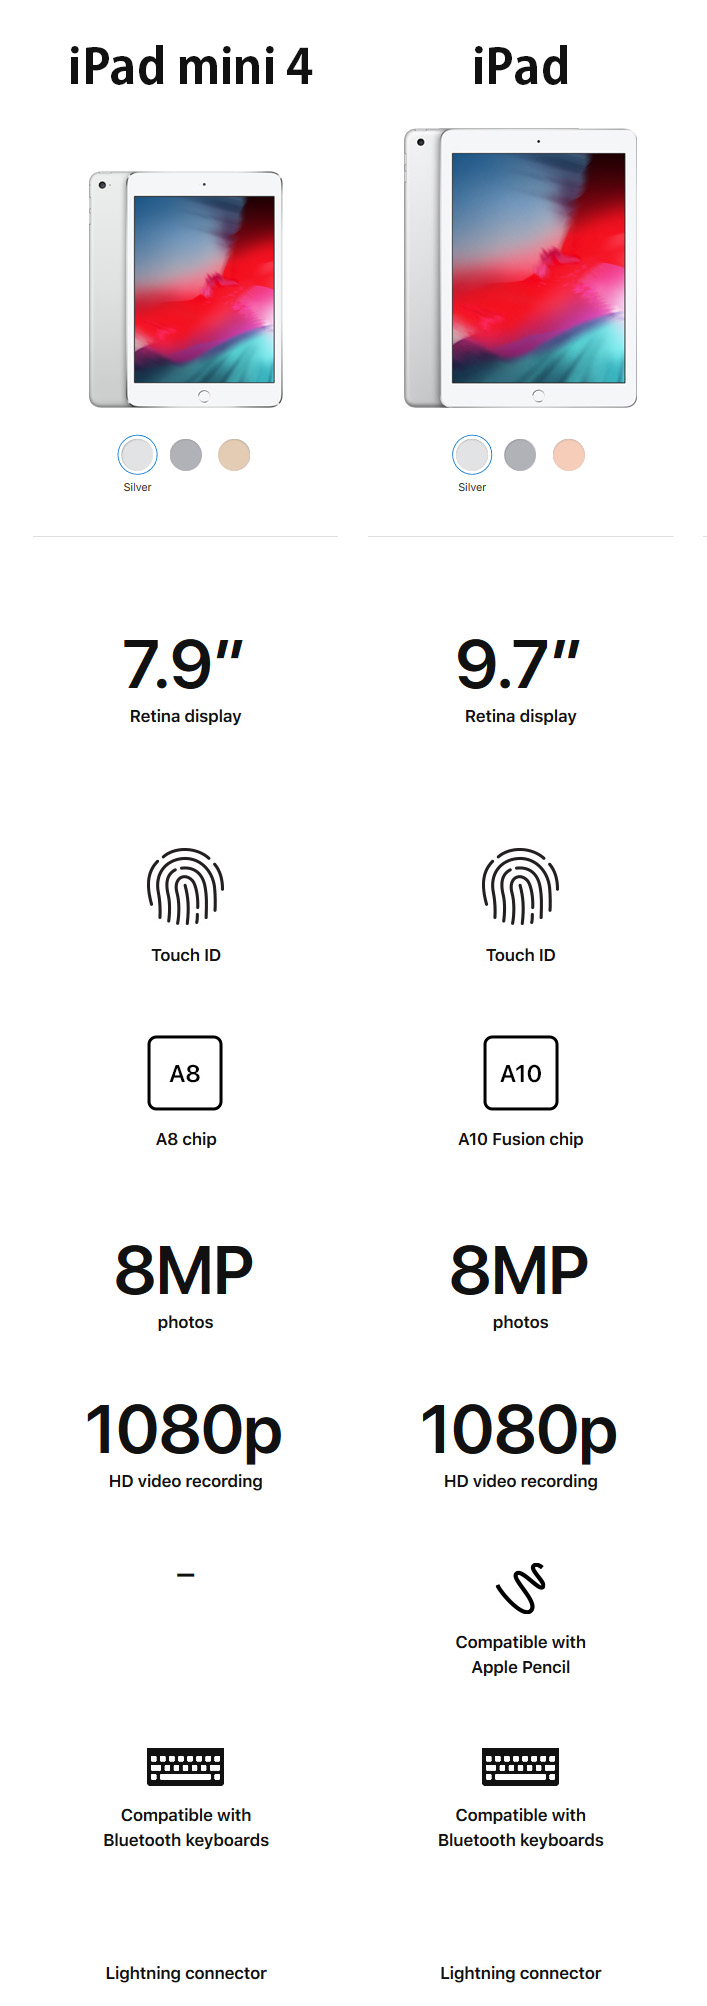 iPad mini 4 vs iPad 9.7